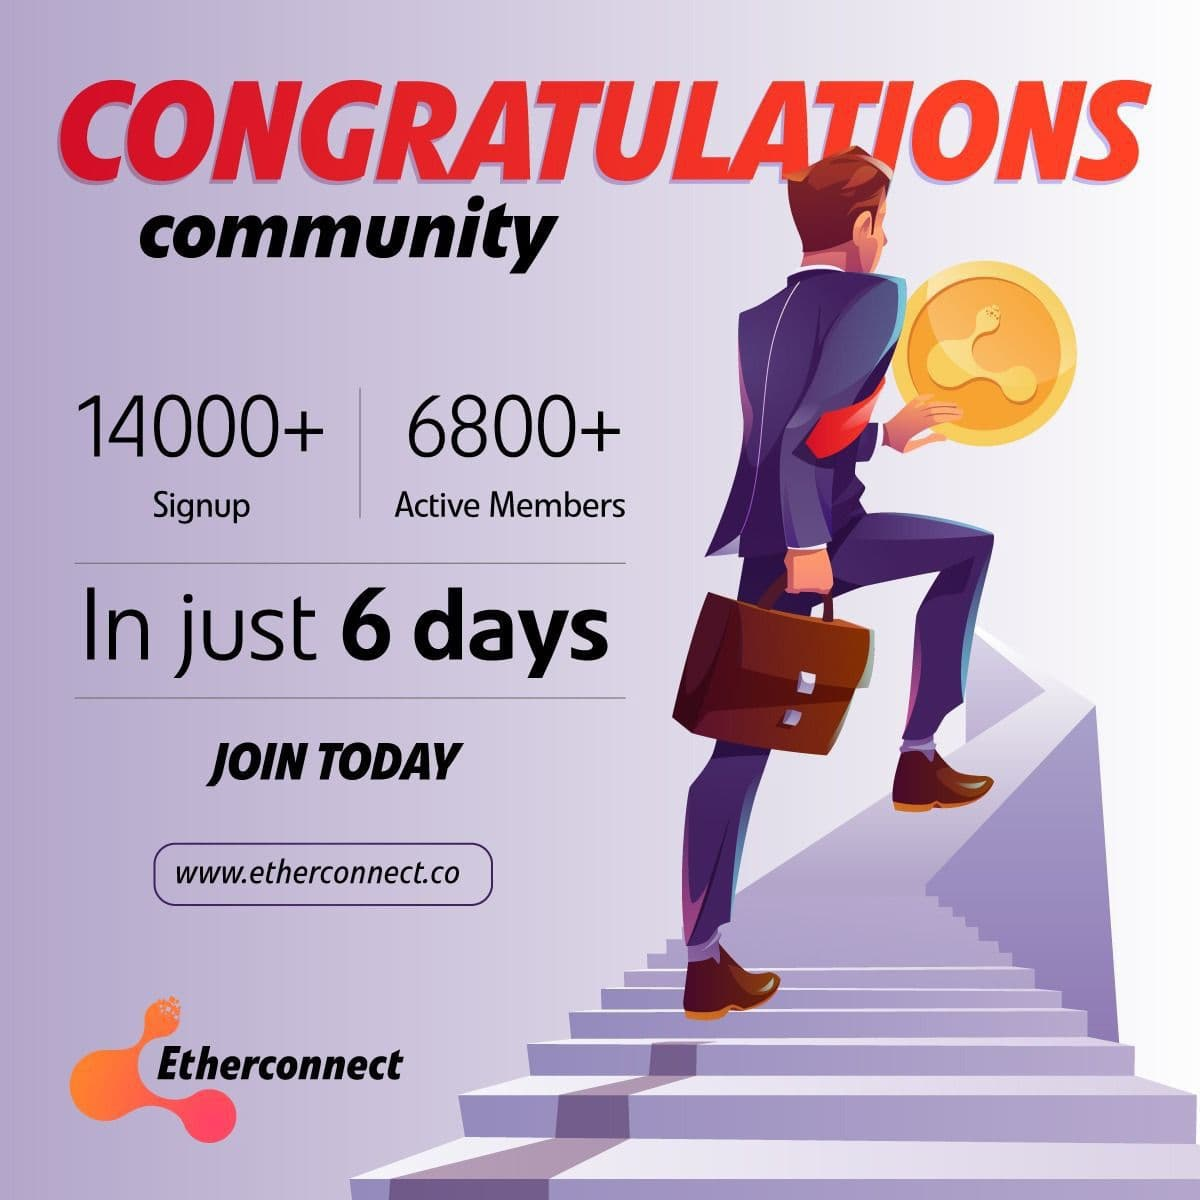 Etherconnect so luong nguoi tham gia